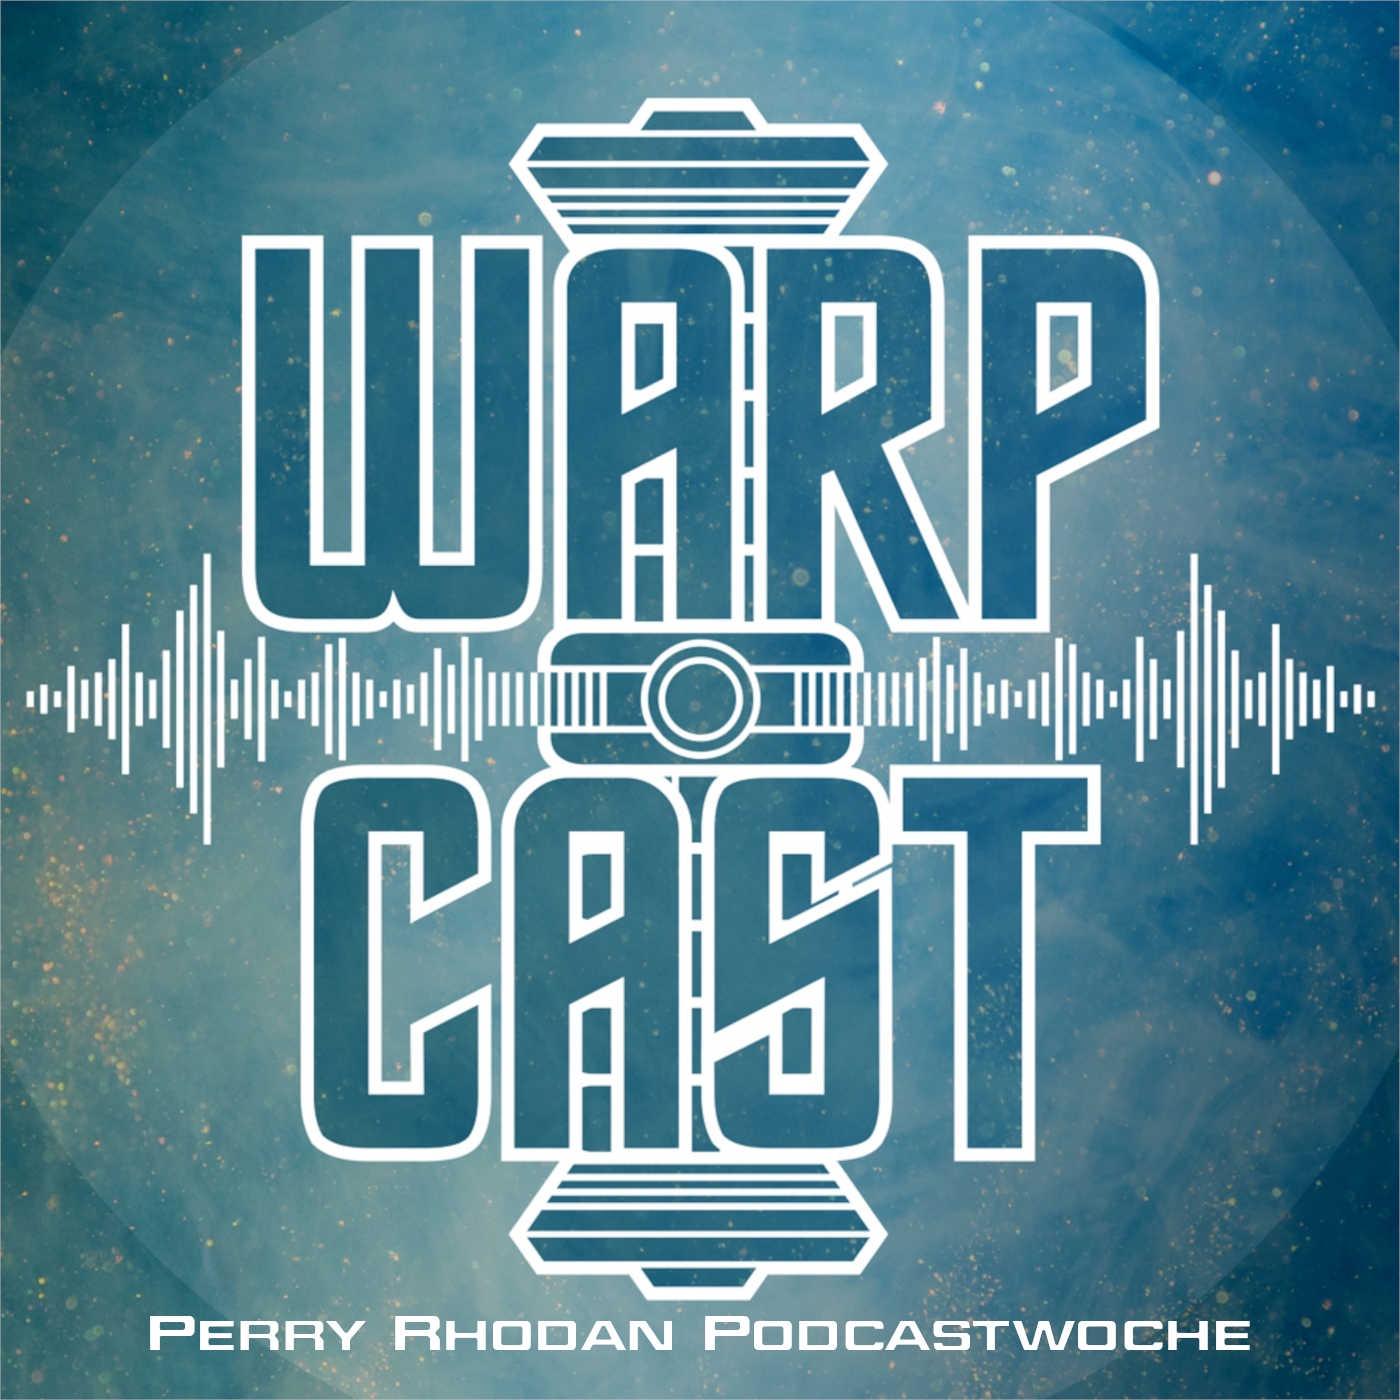 Perry Rhodan Podcastwoche: Clark Darlton